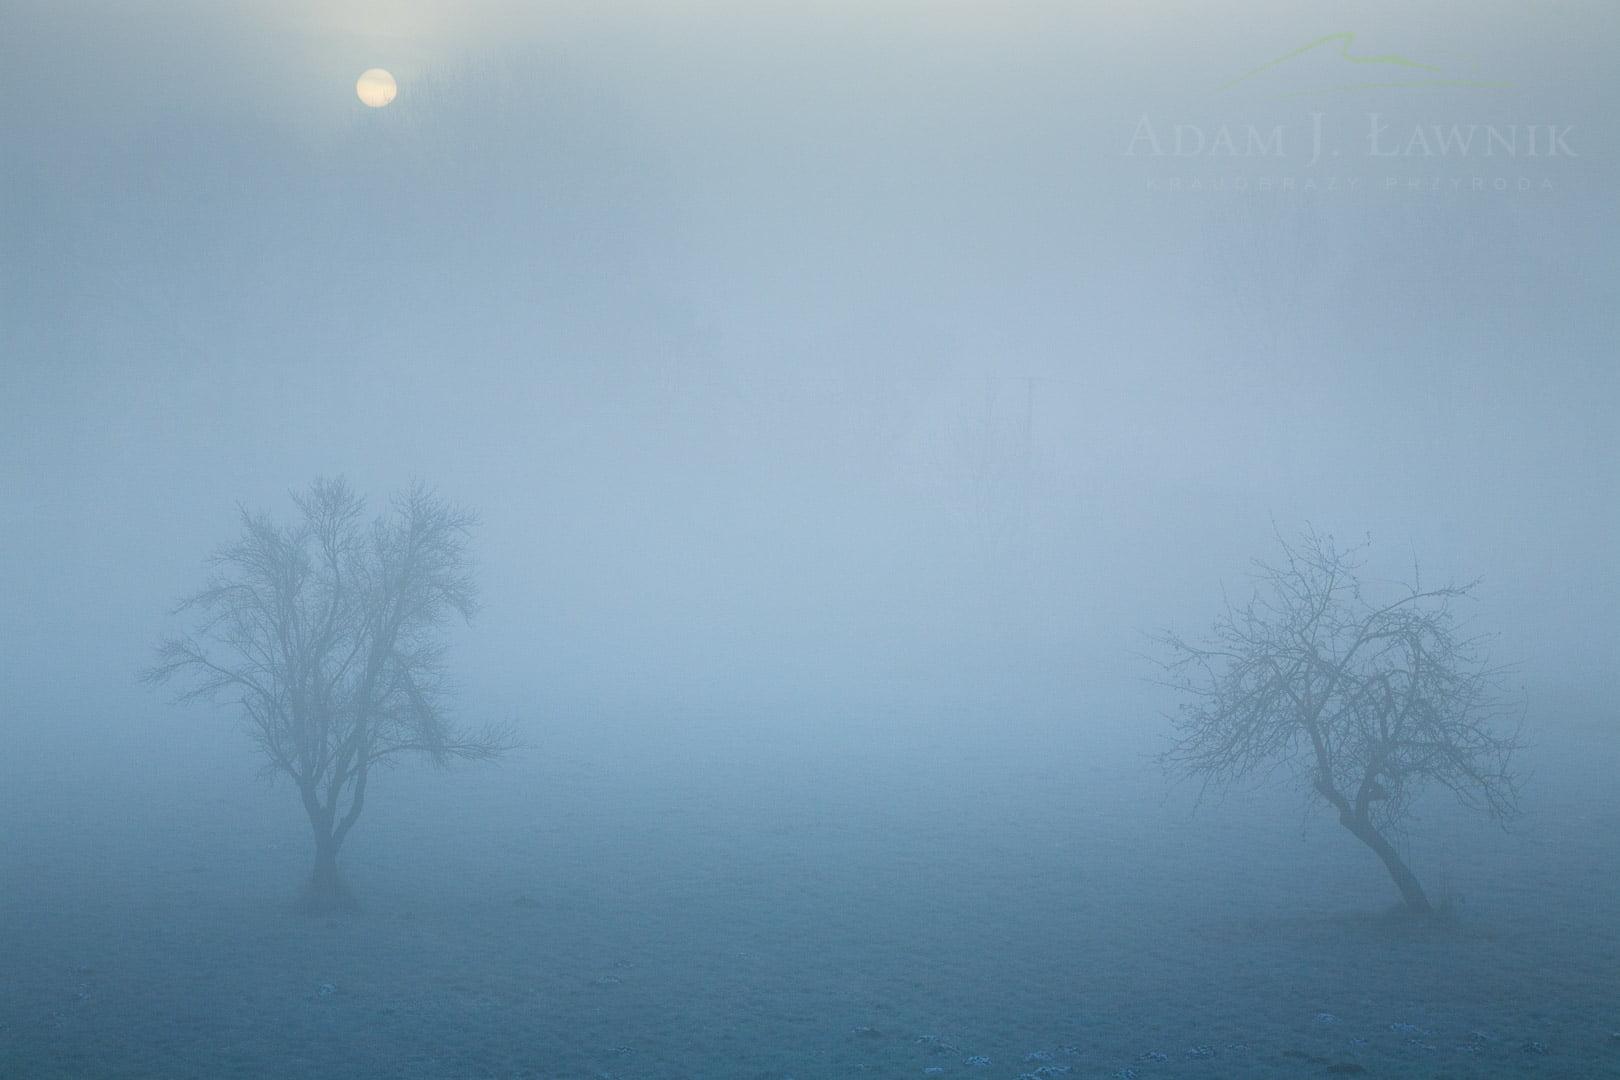 Middle Vistula Valley, Poland 0812-01085C